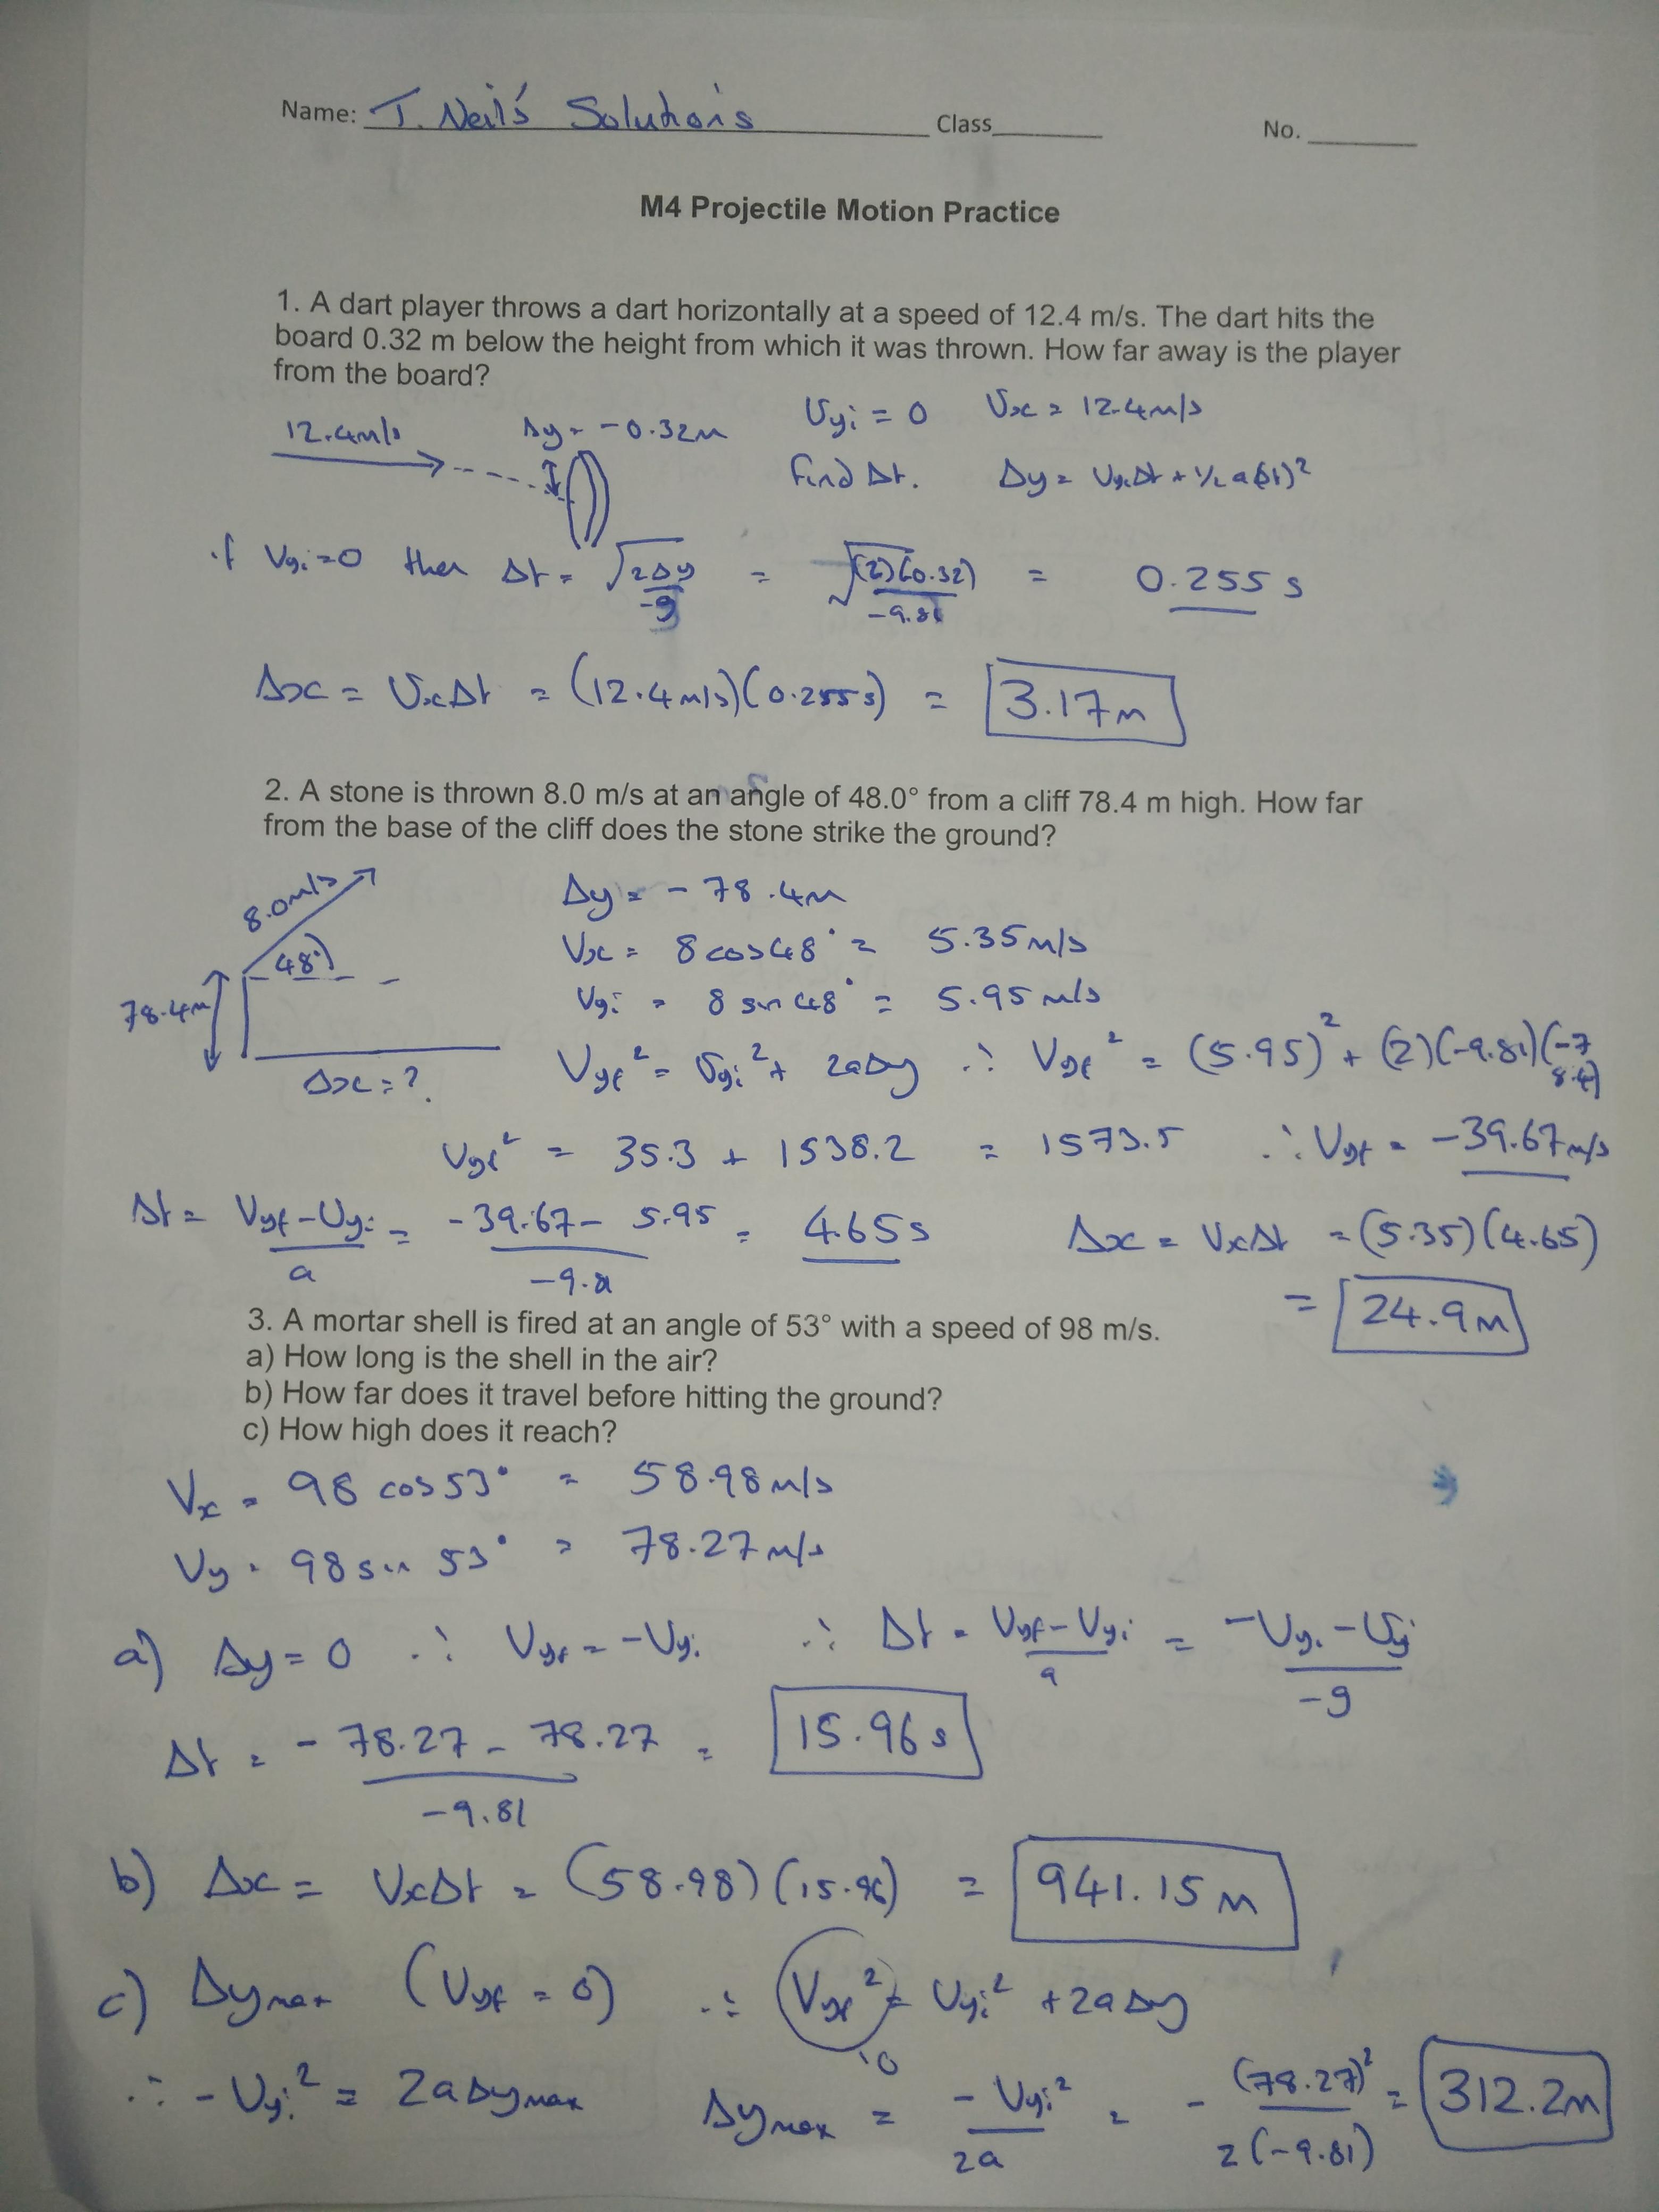 34 Projectile Motion Practice Worksheet